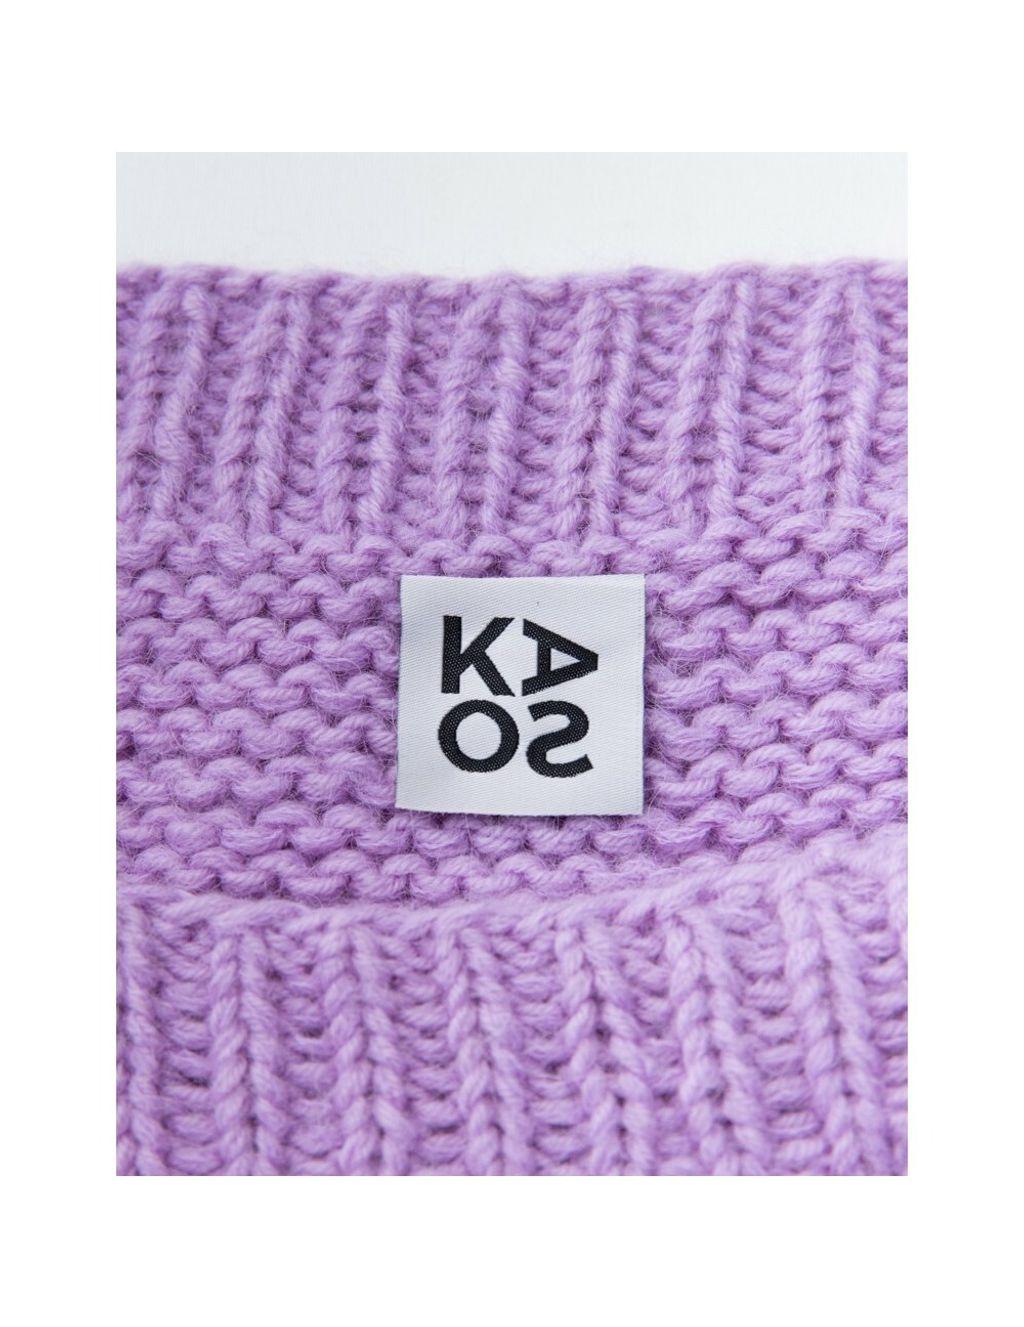 woven-label-kaos-1.jpg